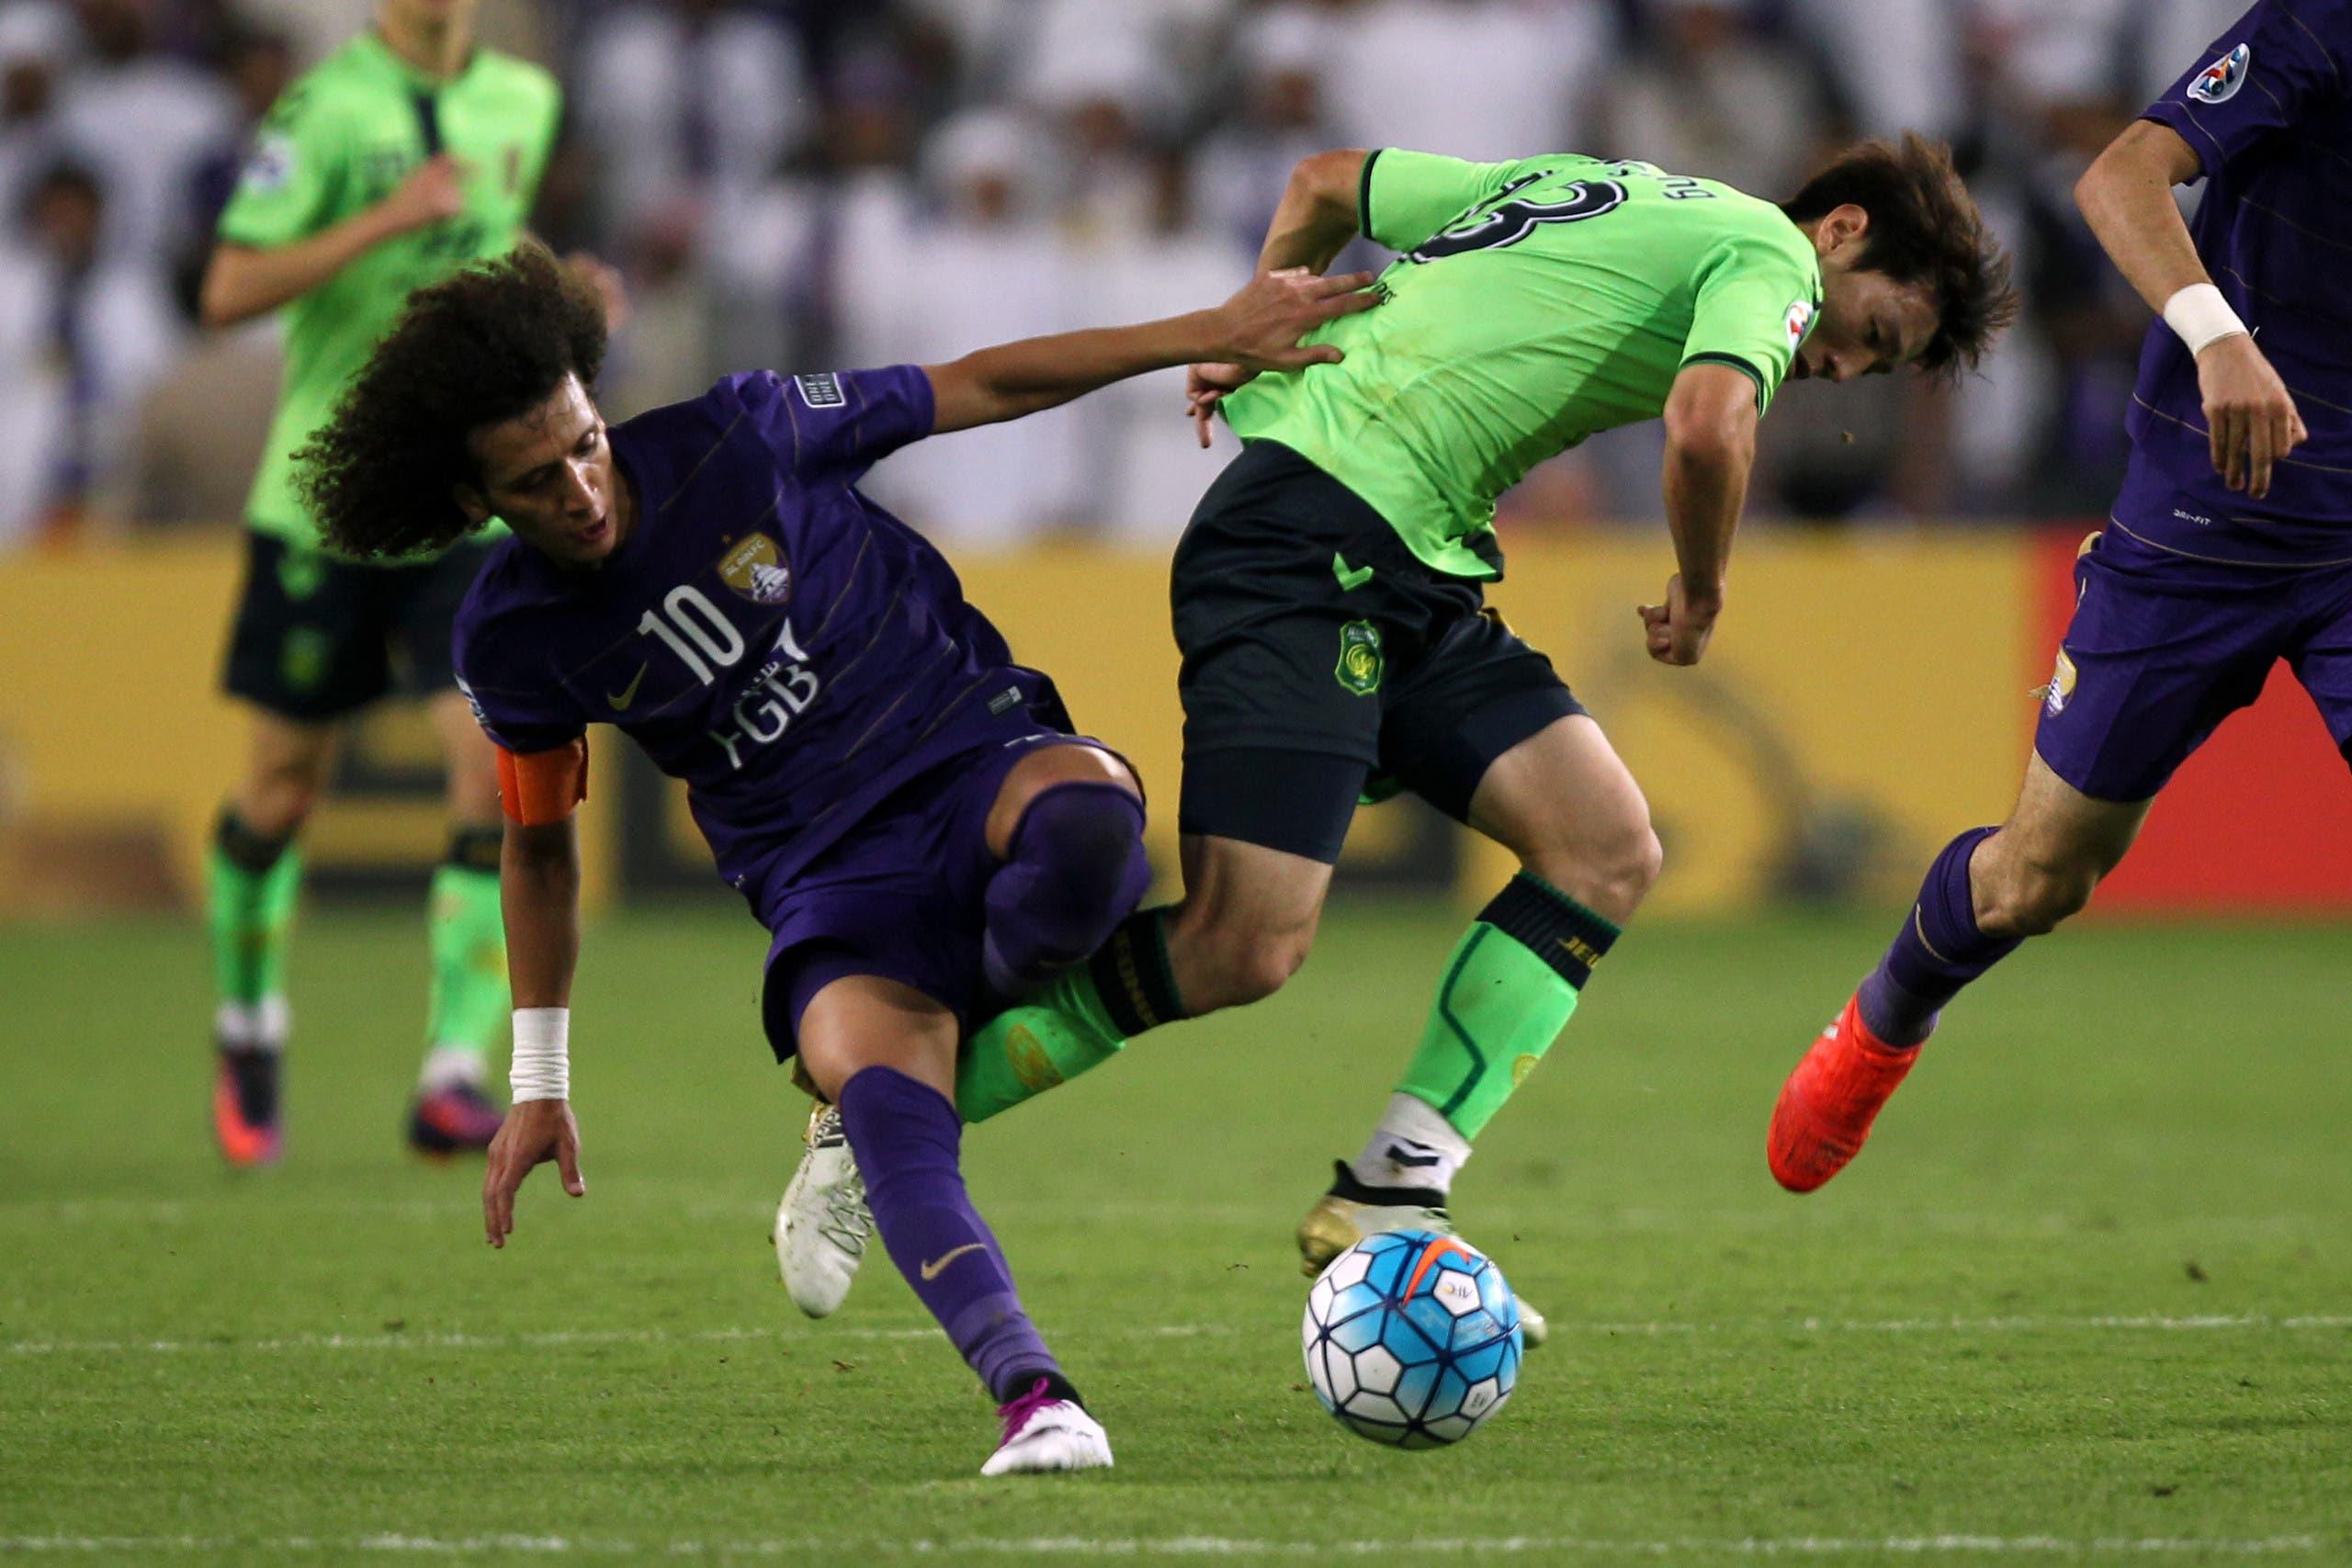 Jeonbuk's midfielder Kim Bo Kyung (R) is tackled by al-Ain's midfielder Omar Abdulrahman during their AFC Champions League final between UAE's Al-Ain and South Korea's Jeonbuk Hyundai Motors at the Hazza bin Zayed Stadium in Al-Ain on November 26, 2016. (AFP)